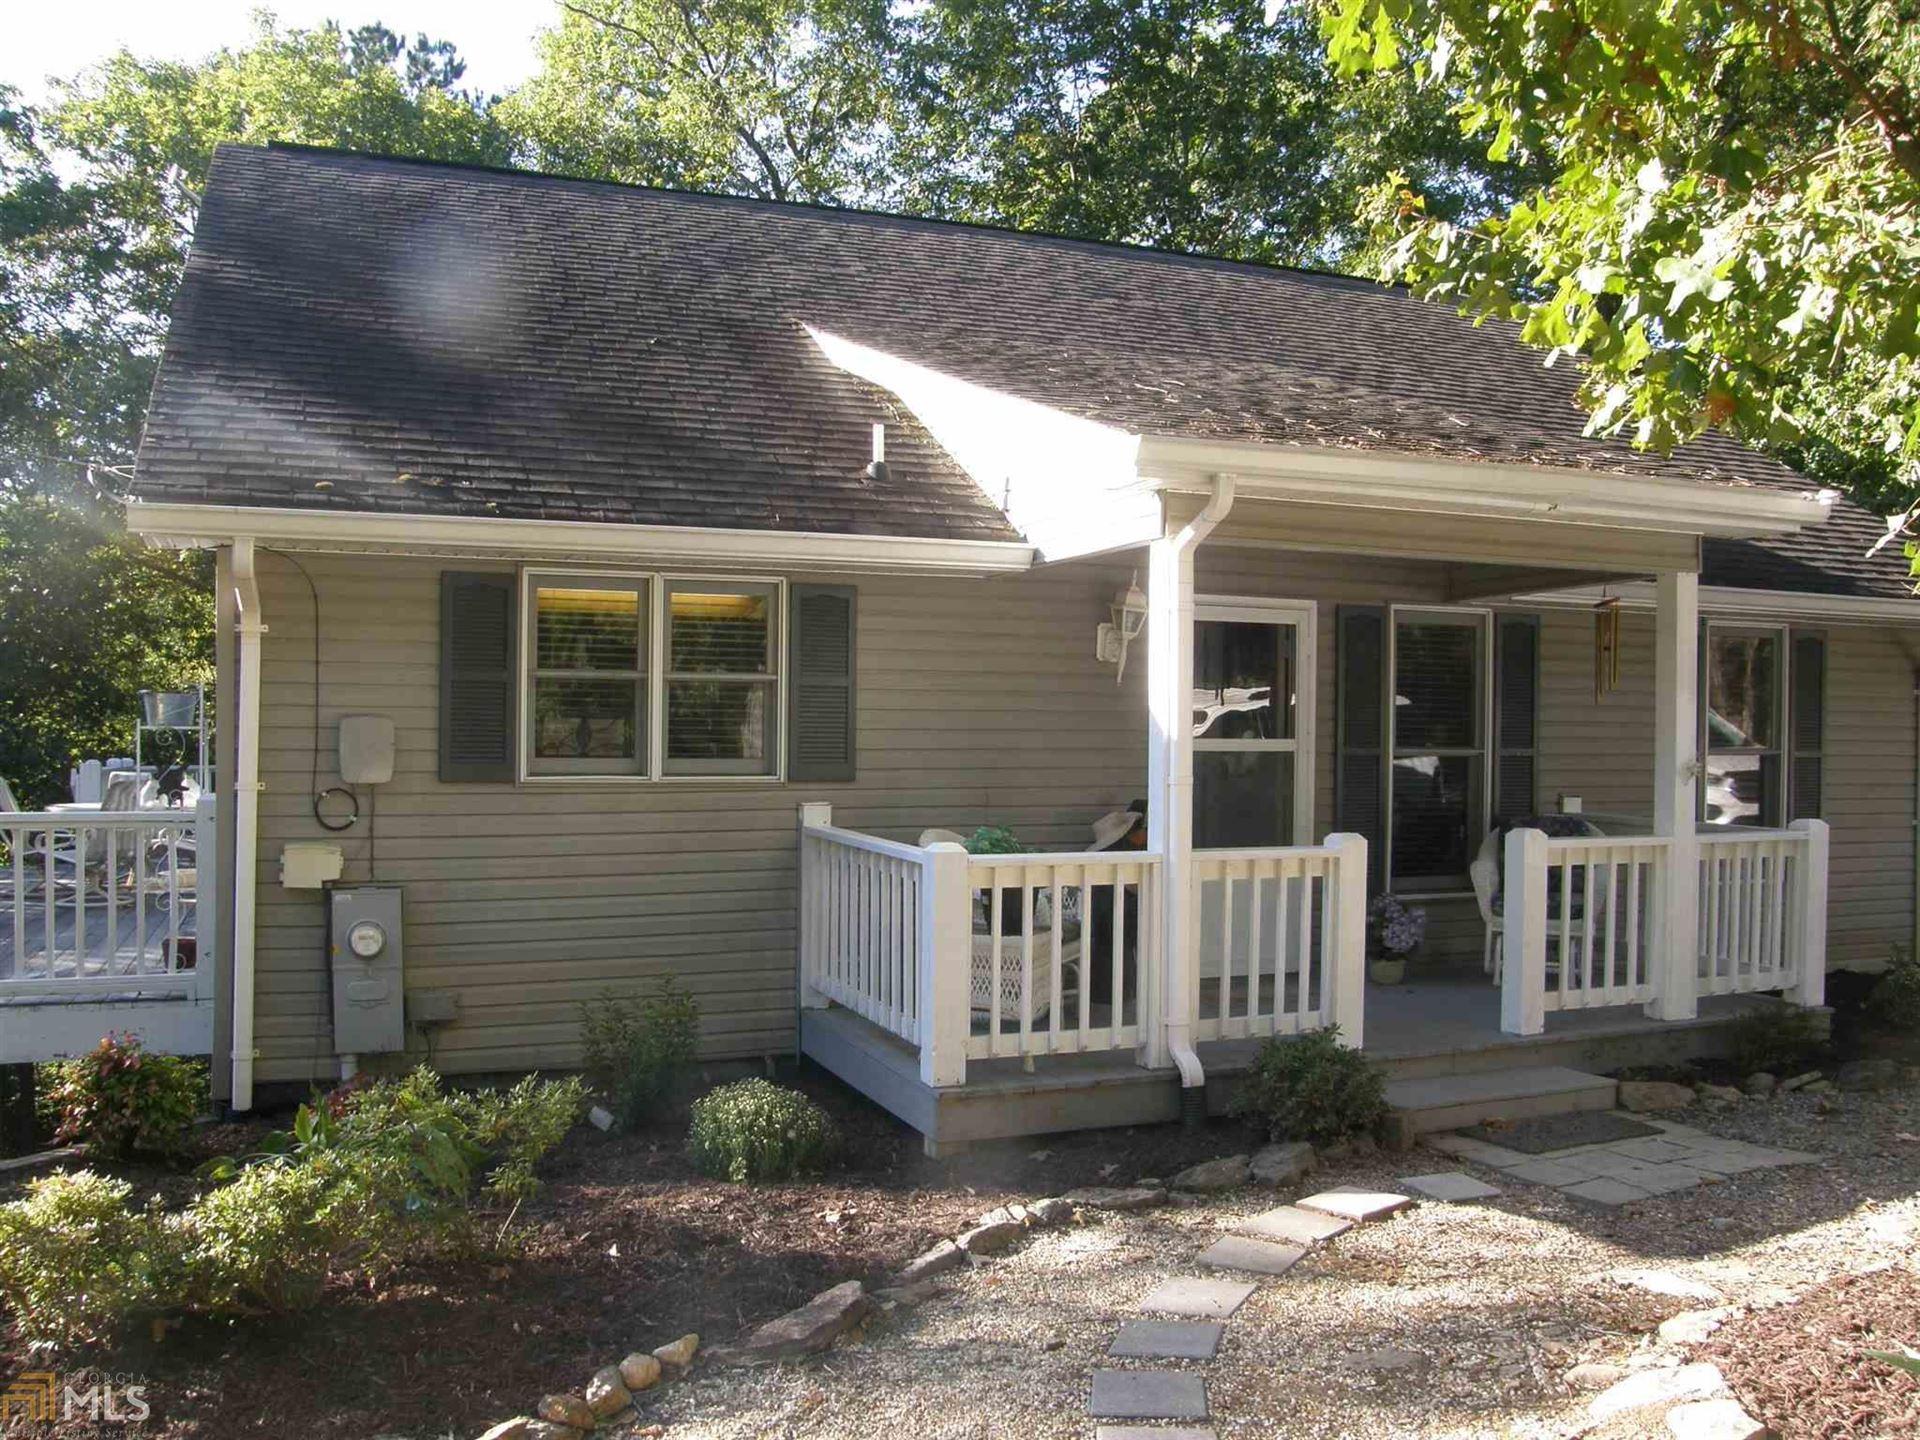 1298 Cherokee Trl, Young Harris, GA 30582 - MLS#: 8868552